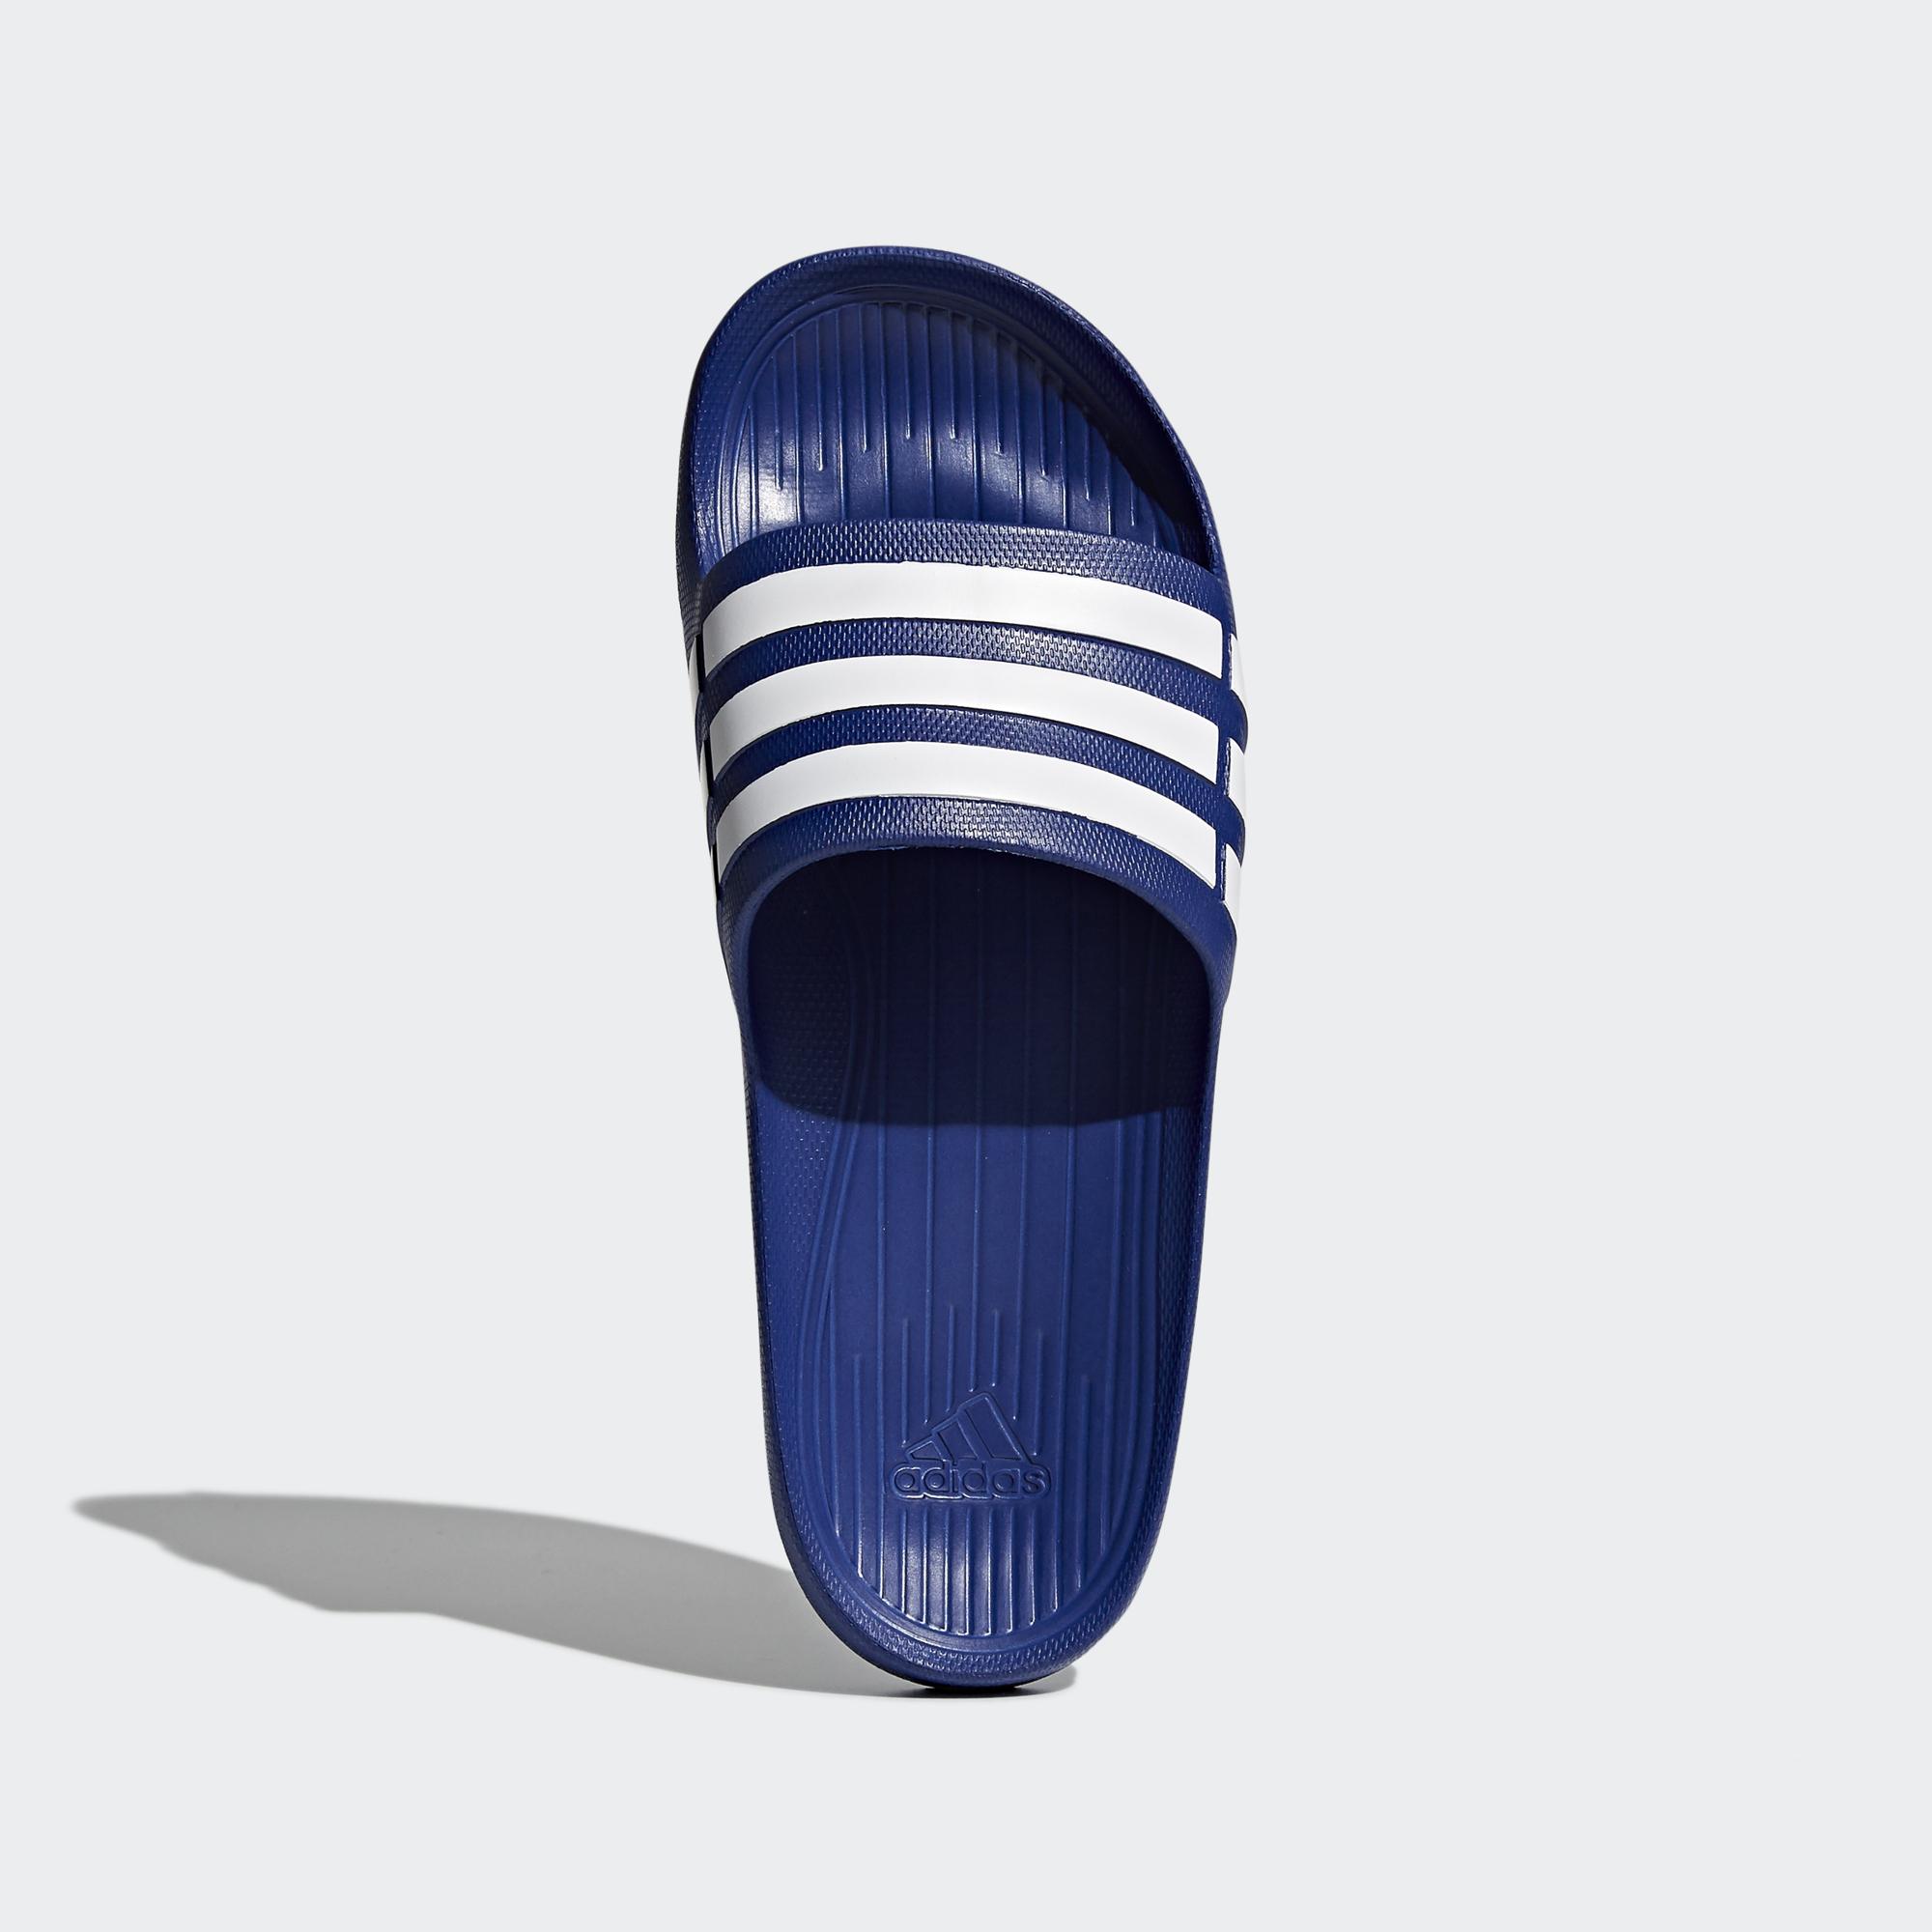 c3dca128ee45c Šľapky Adidas - Duramo Slide G14309 pánske - Teniskovo.online